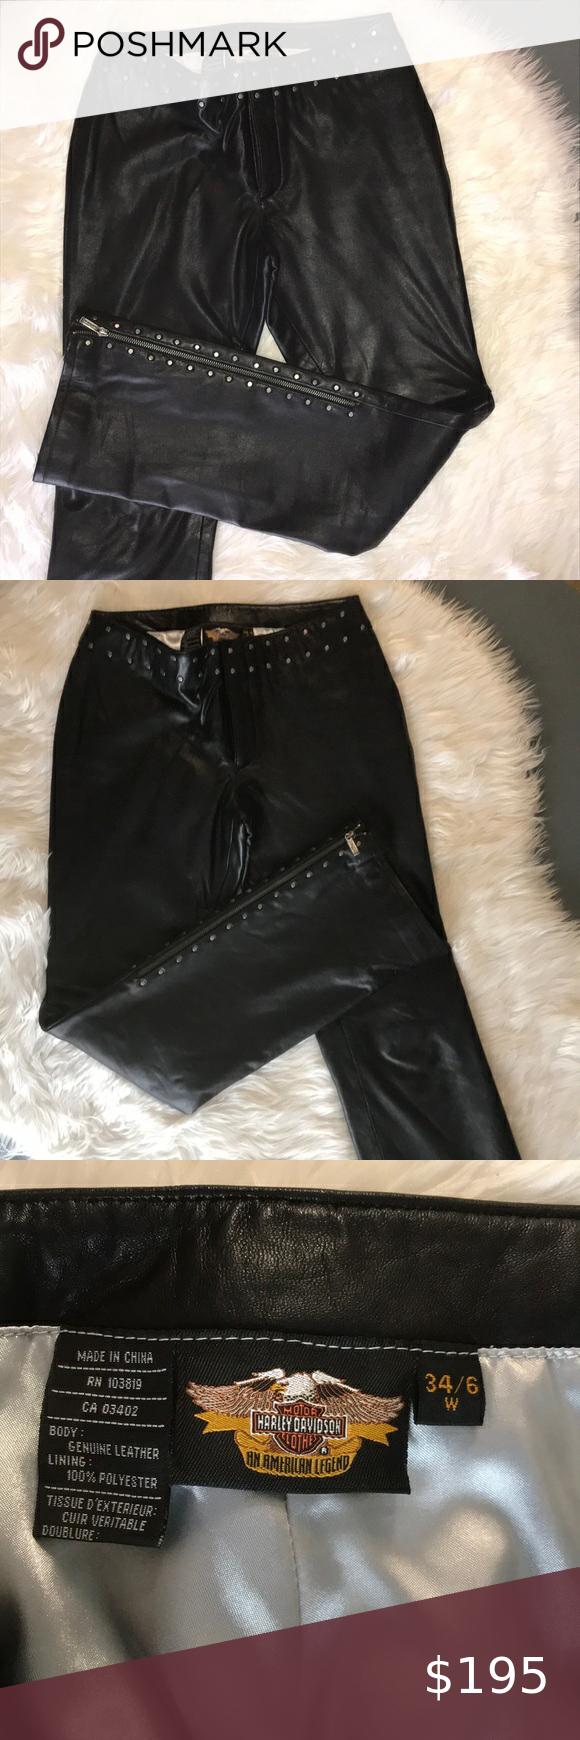 Harley Davidson Ladies Leather Riding Pants-size 12